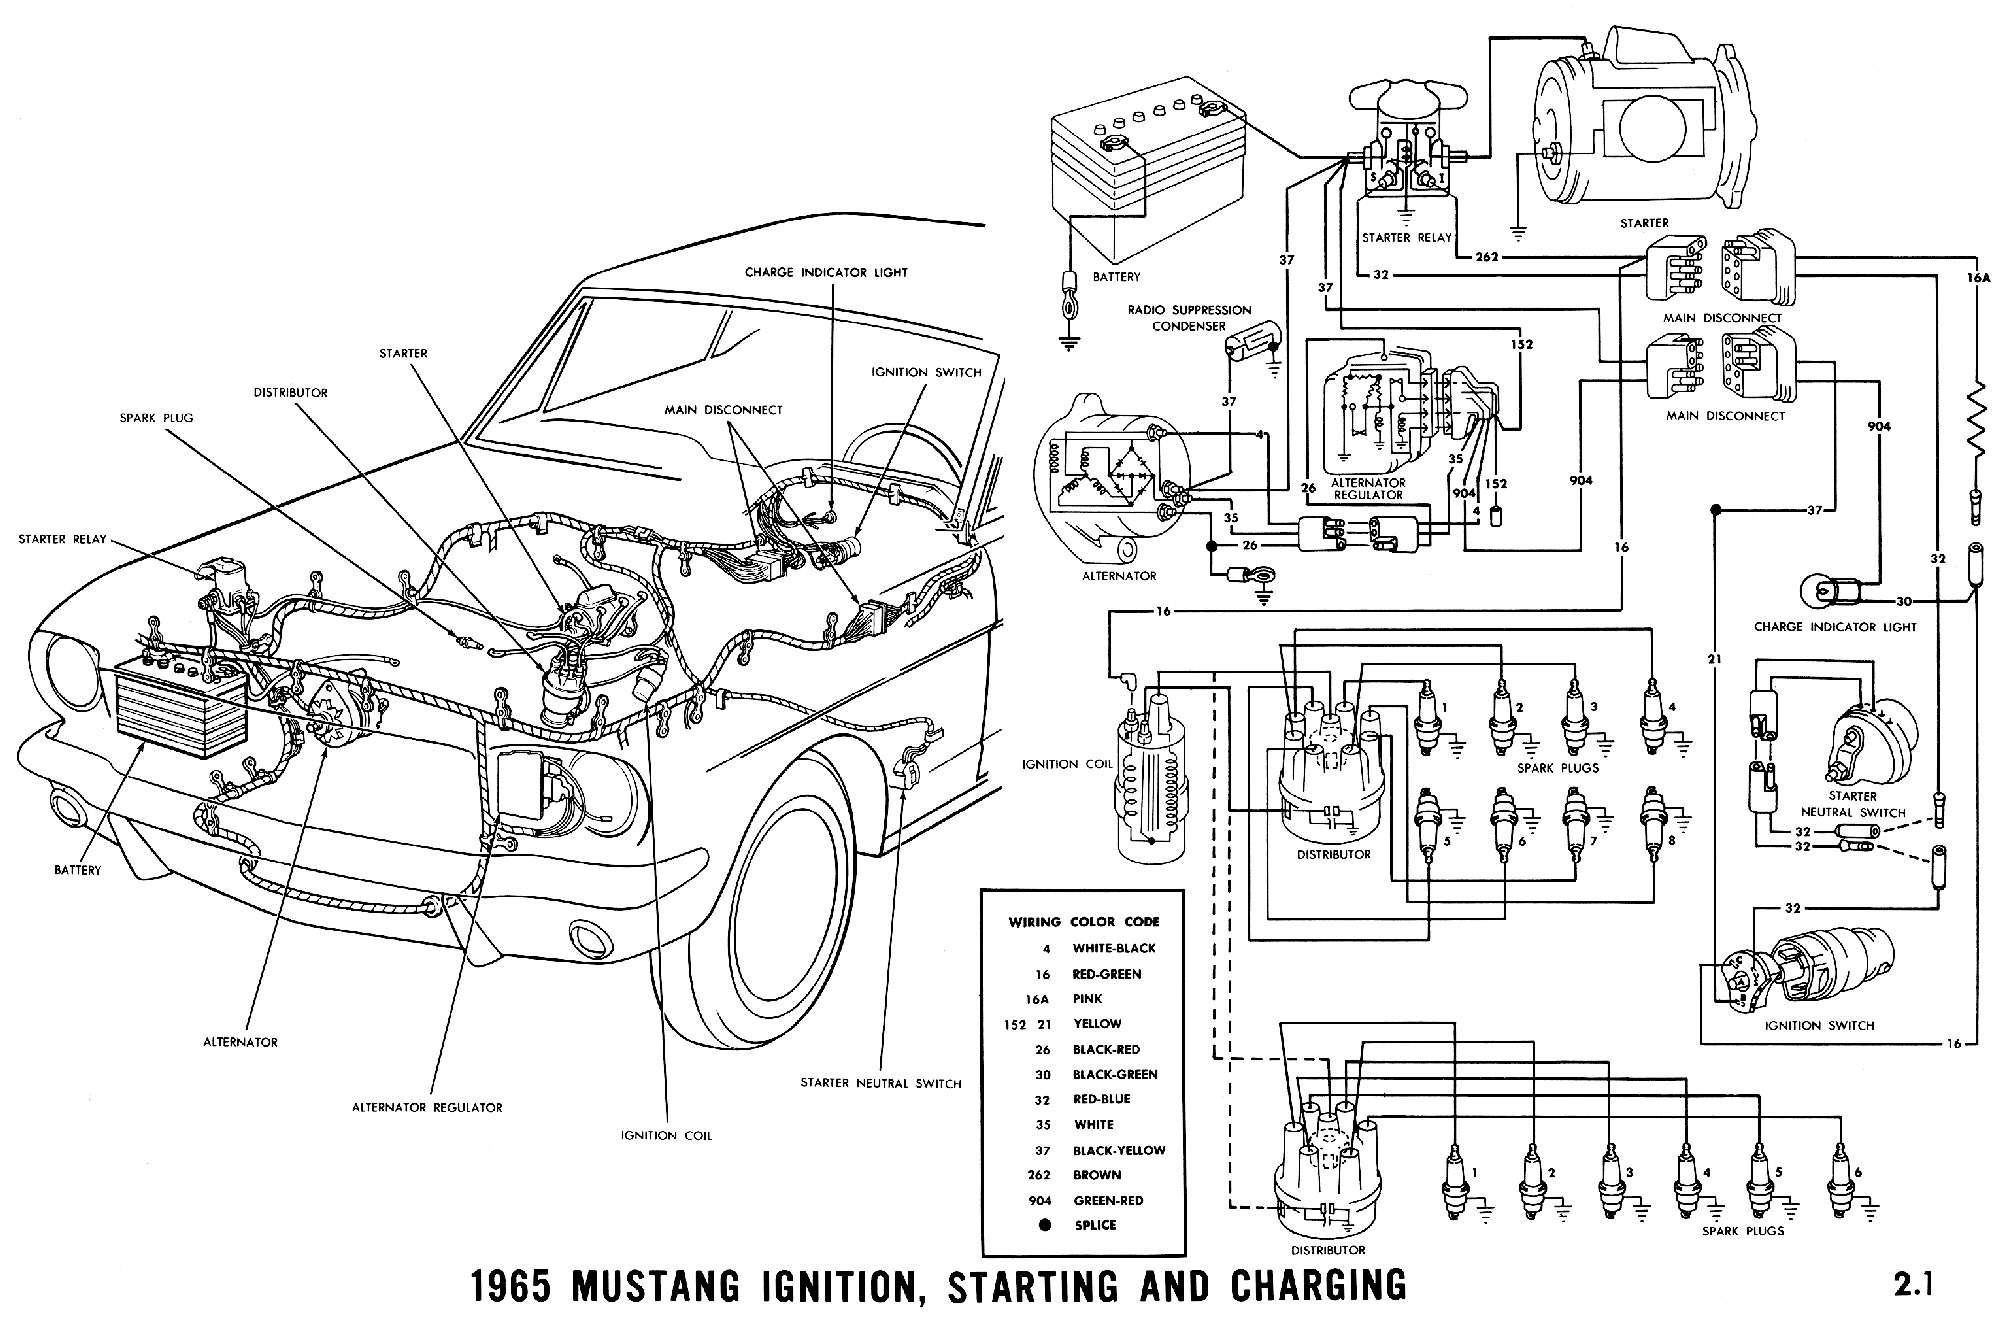 Car Engine Labeled Diagram Car Parts Labeled Diagram Engine Parts Diagram Names ] Saab Plug Of Car Engine Labeled Diagram